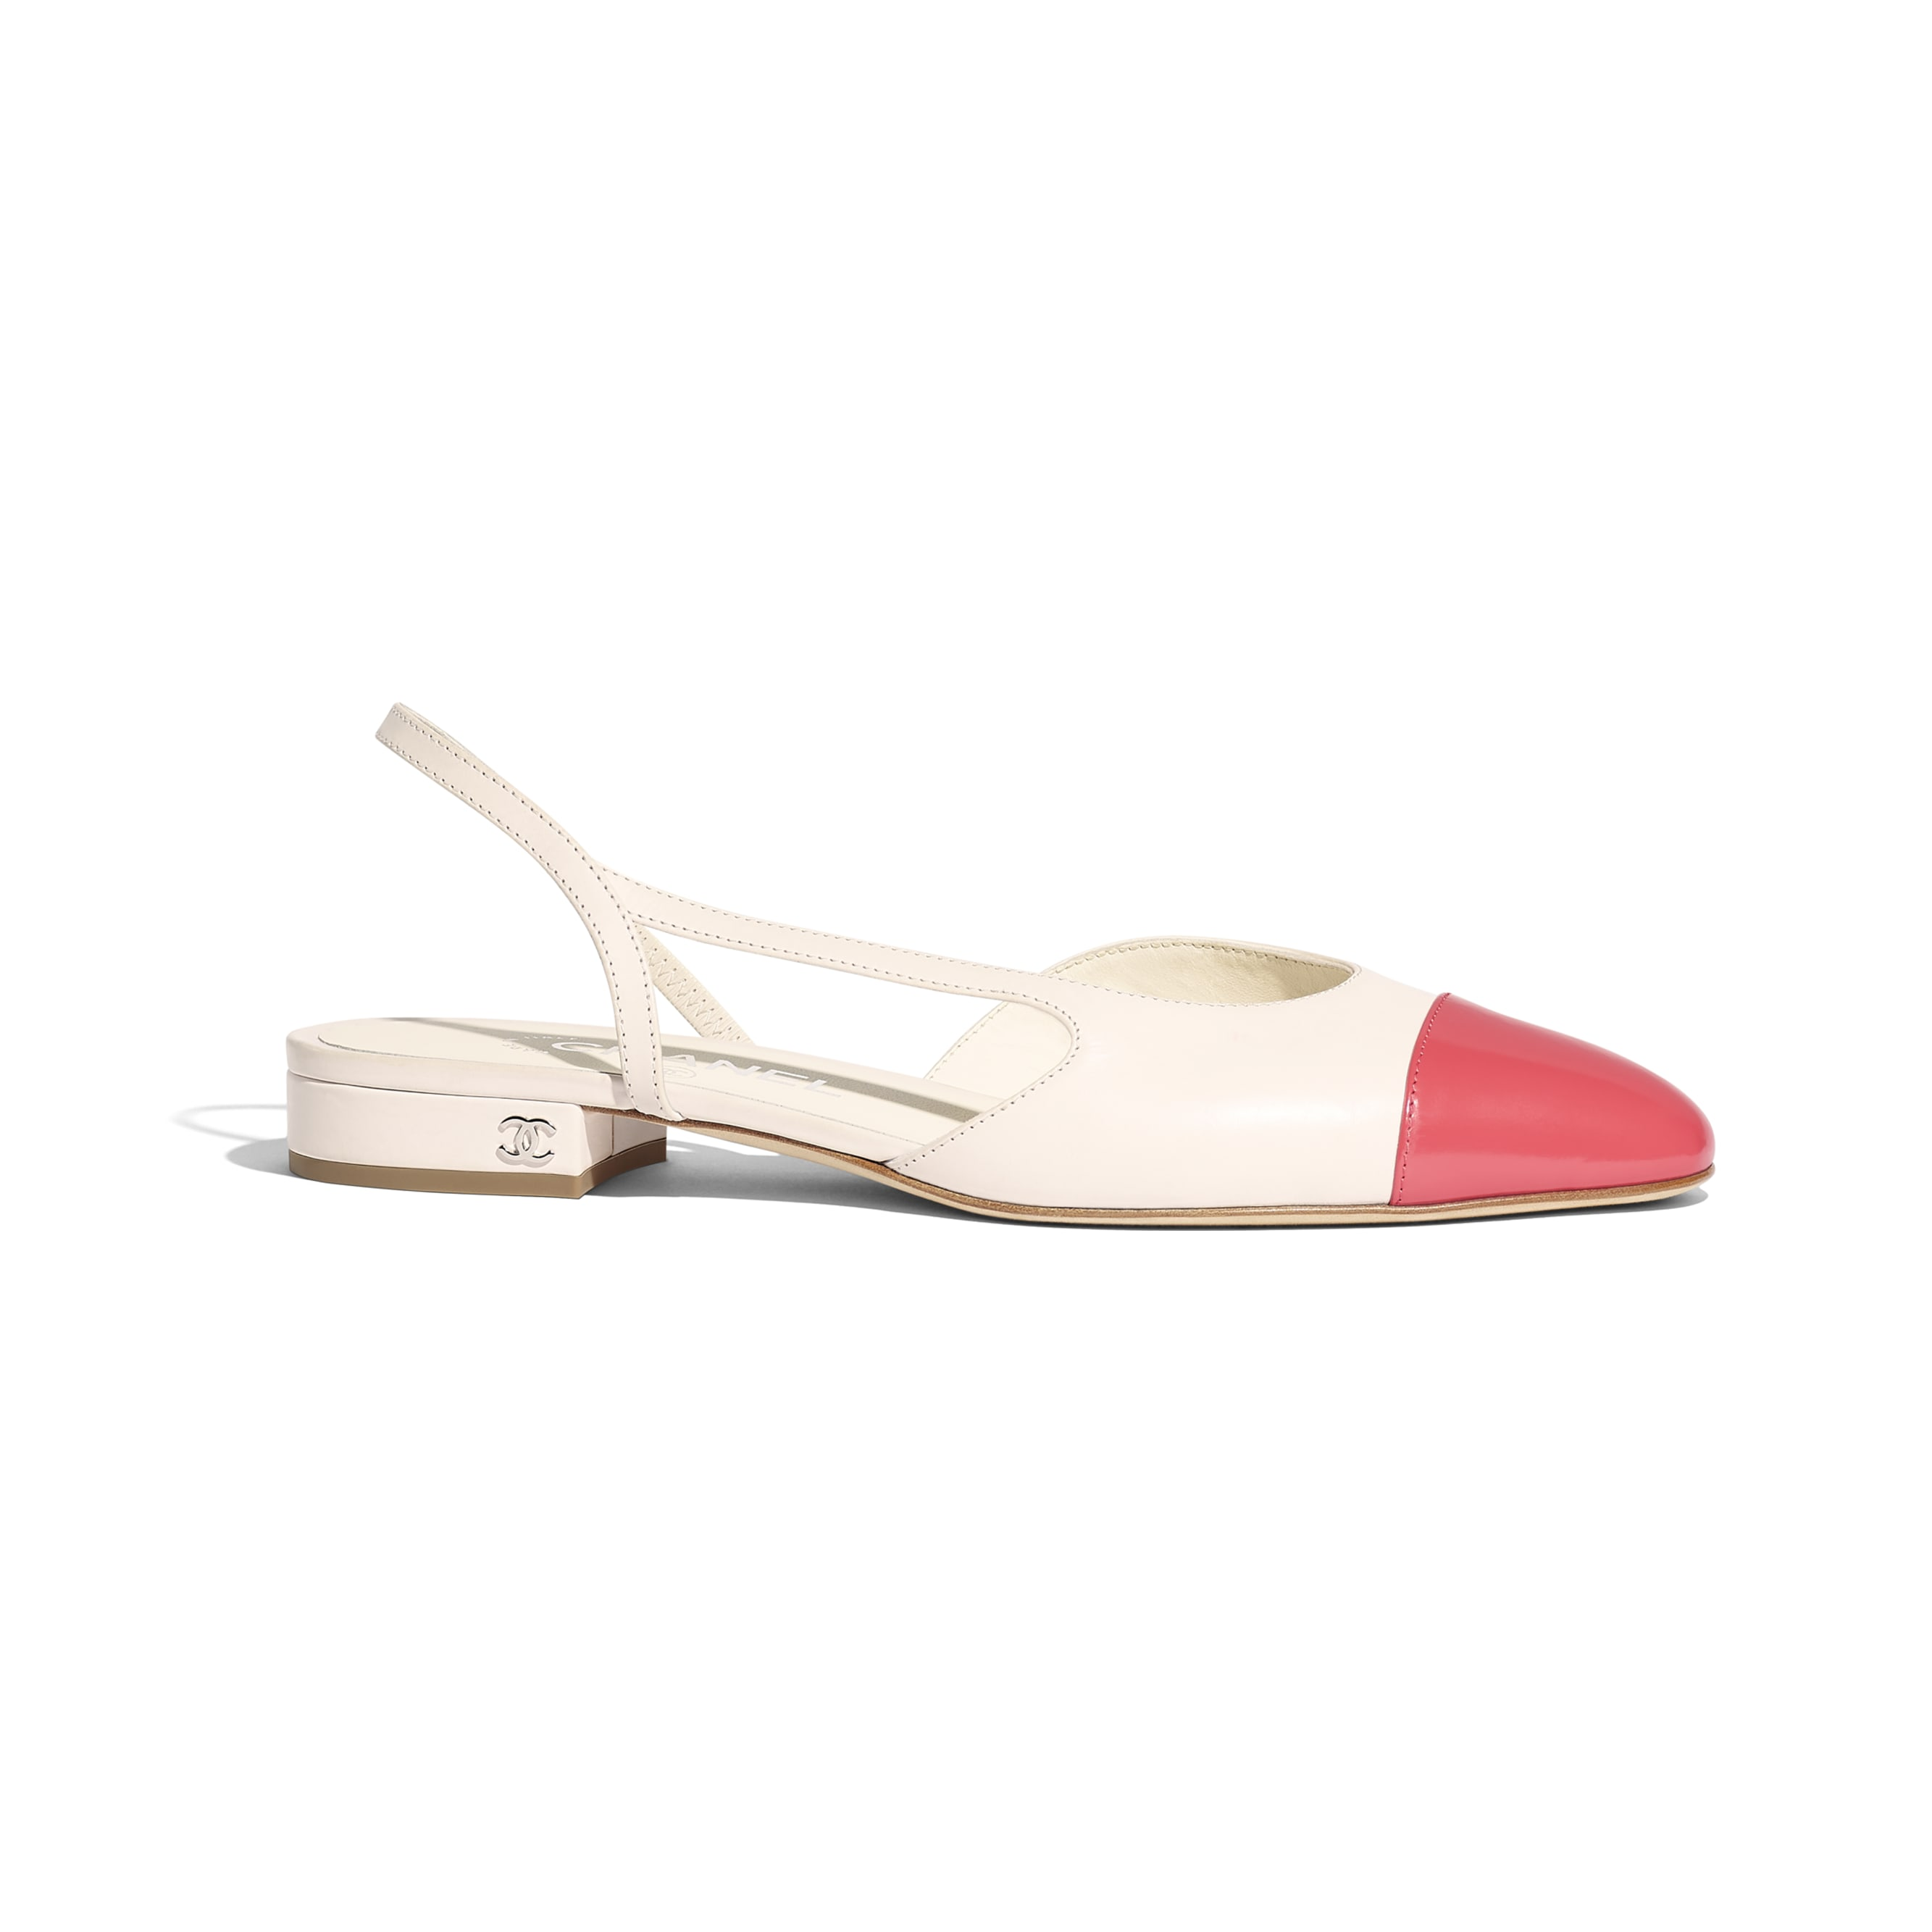 Slingbacks - White & Red - Calfskin & Glazed Calfskin - Default view - see standard sized version